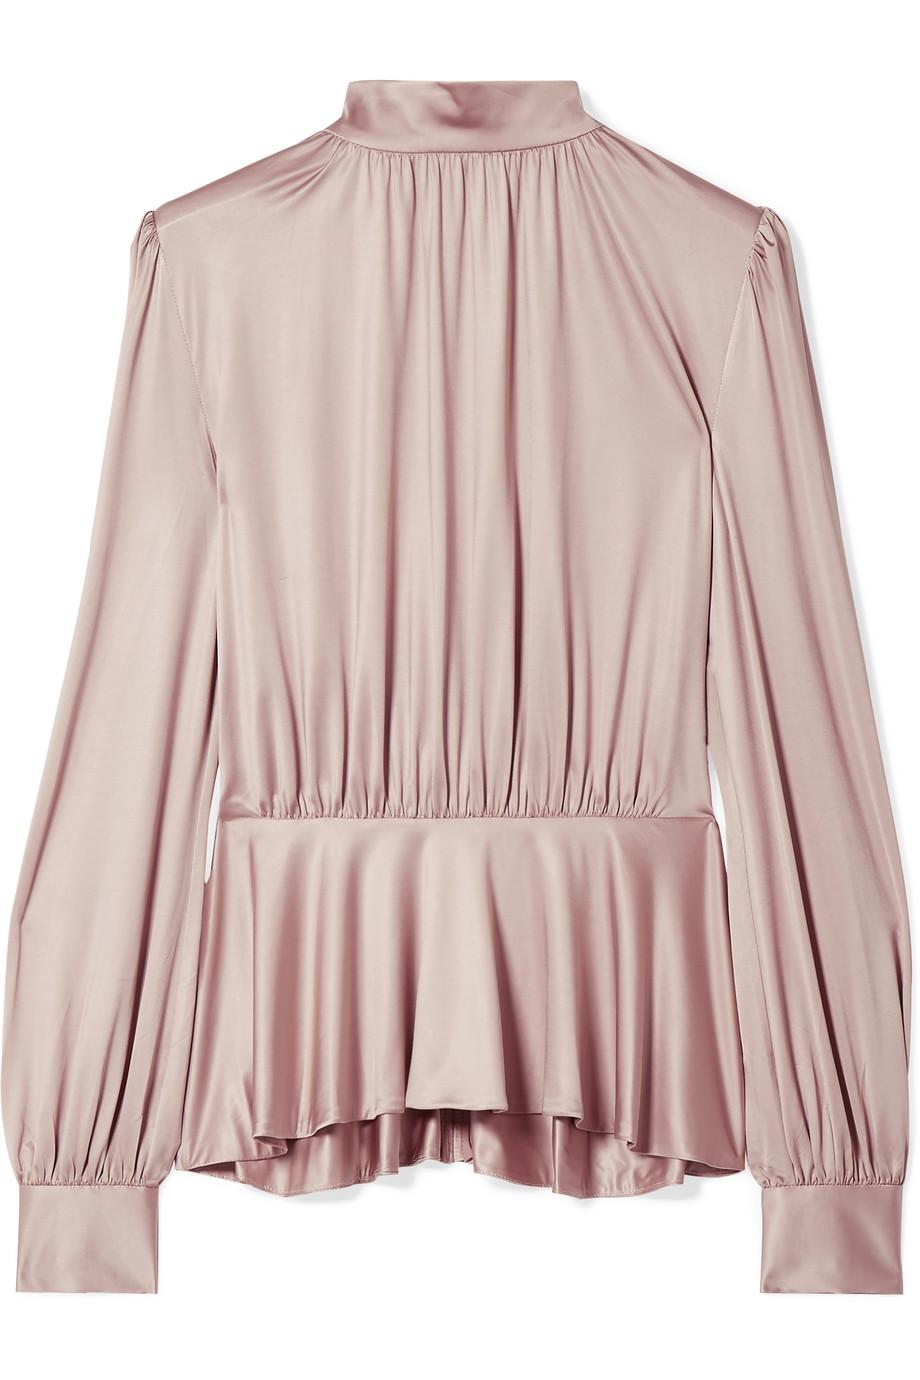 f57f8704e19957 Office Lady Pink Long Sleeve Silk Satin Ruffled Women Blouse - Buy ...